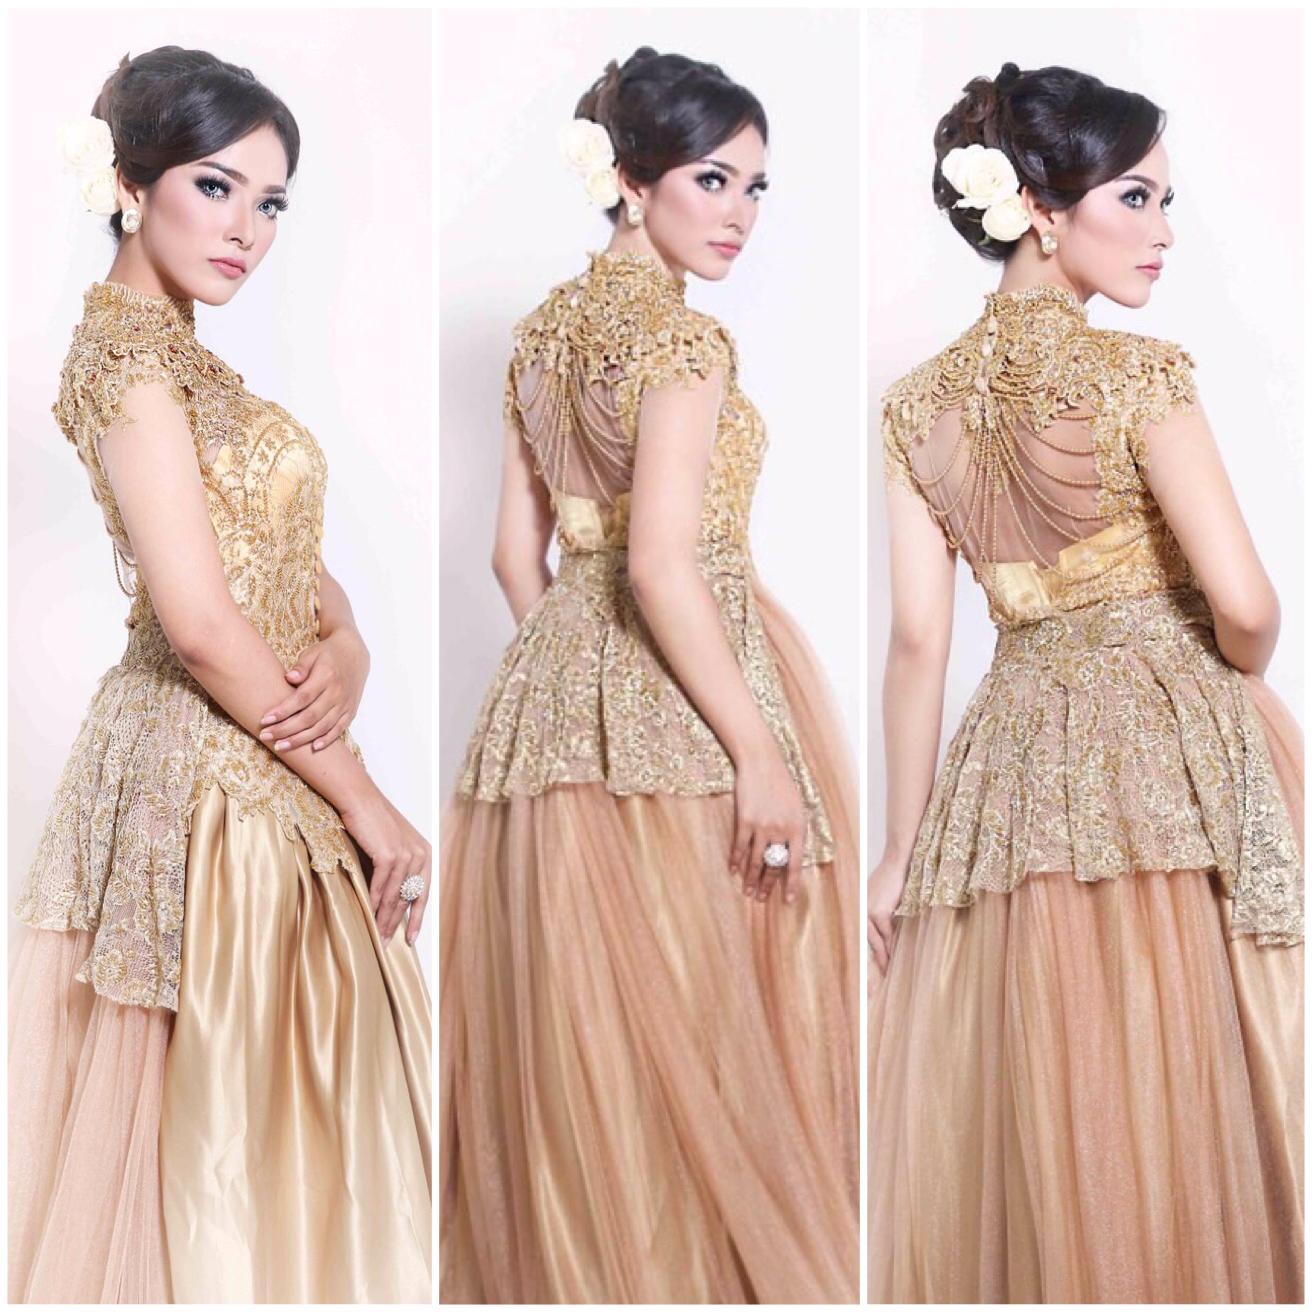 Directory of Wedding Dresses Vendors in Bandung  Bridestory.com